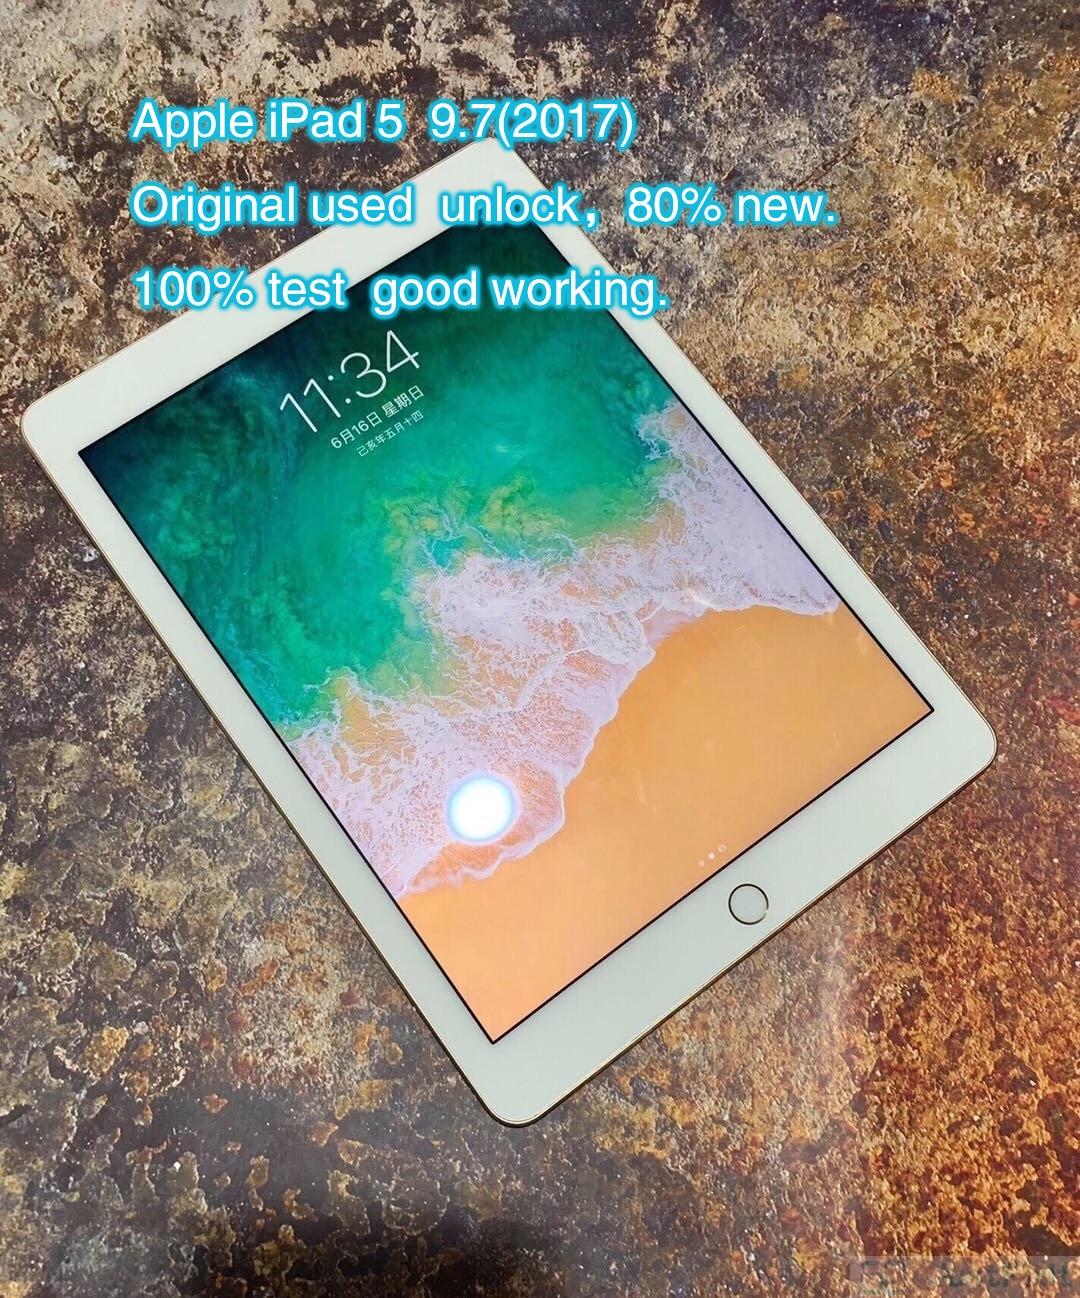 Original Refurbish Apple IPad 5 ipad  A1823  A1822 5th IPAD 2017 9.7 inches Wifi Version Black white About 80% New